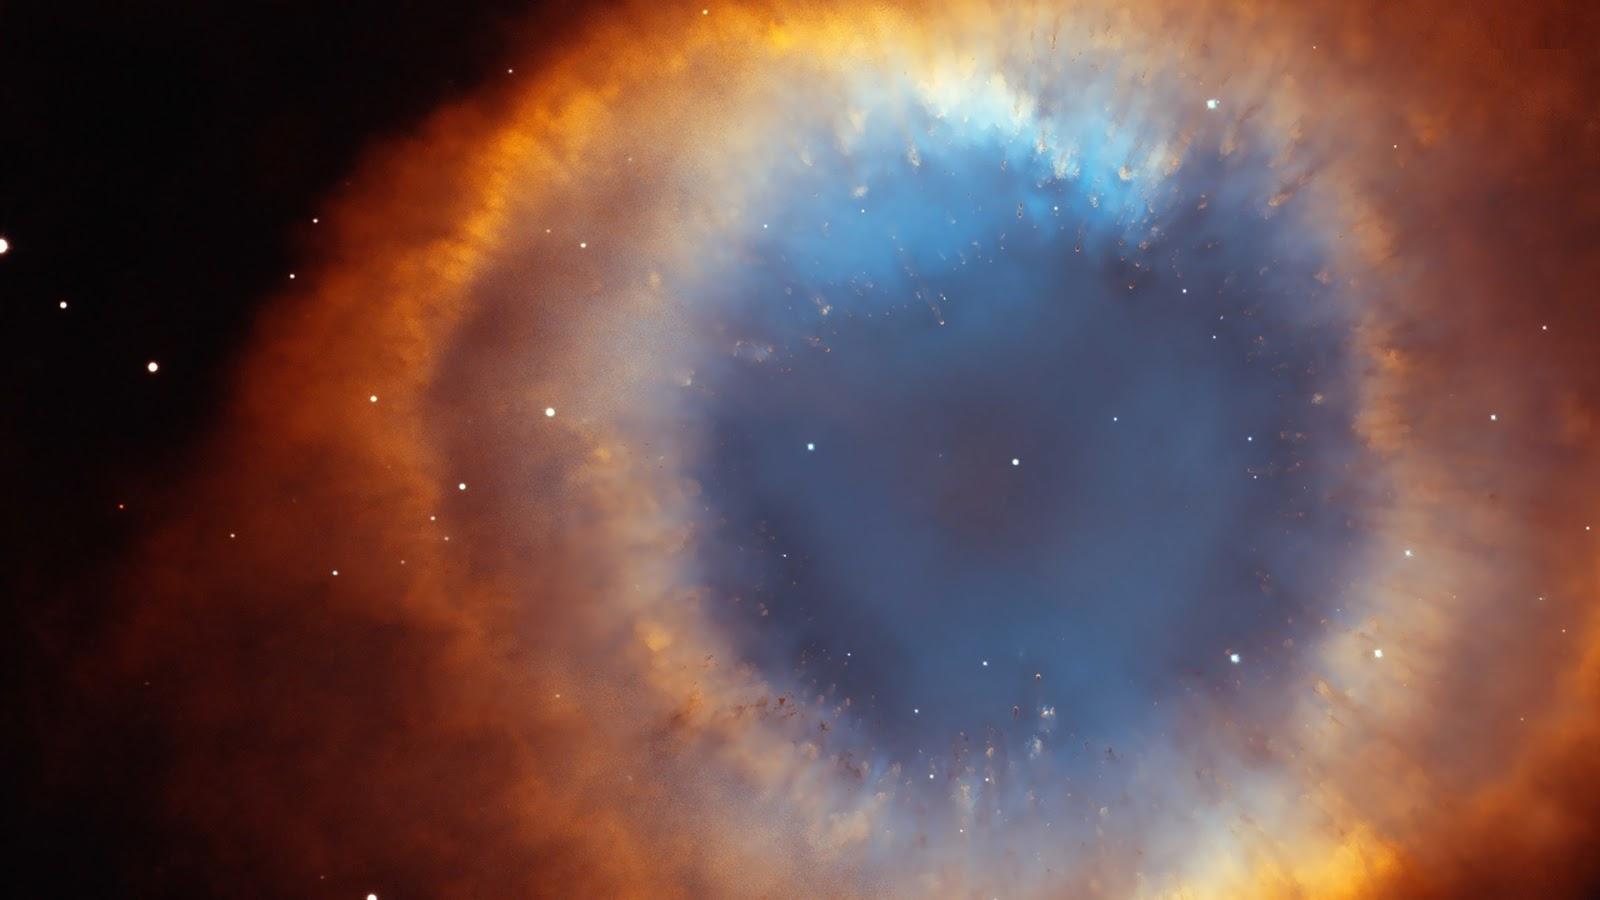 Iss Hd Wallpaper Helix Nebula Wallpaper Hd Earth Blog